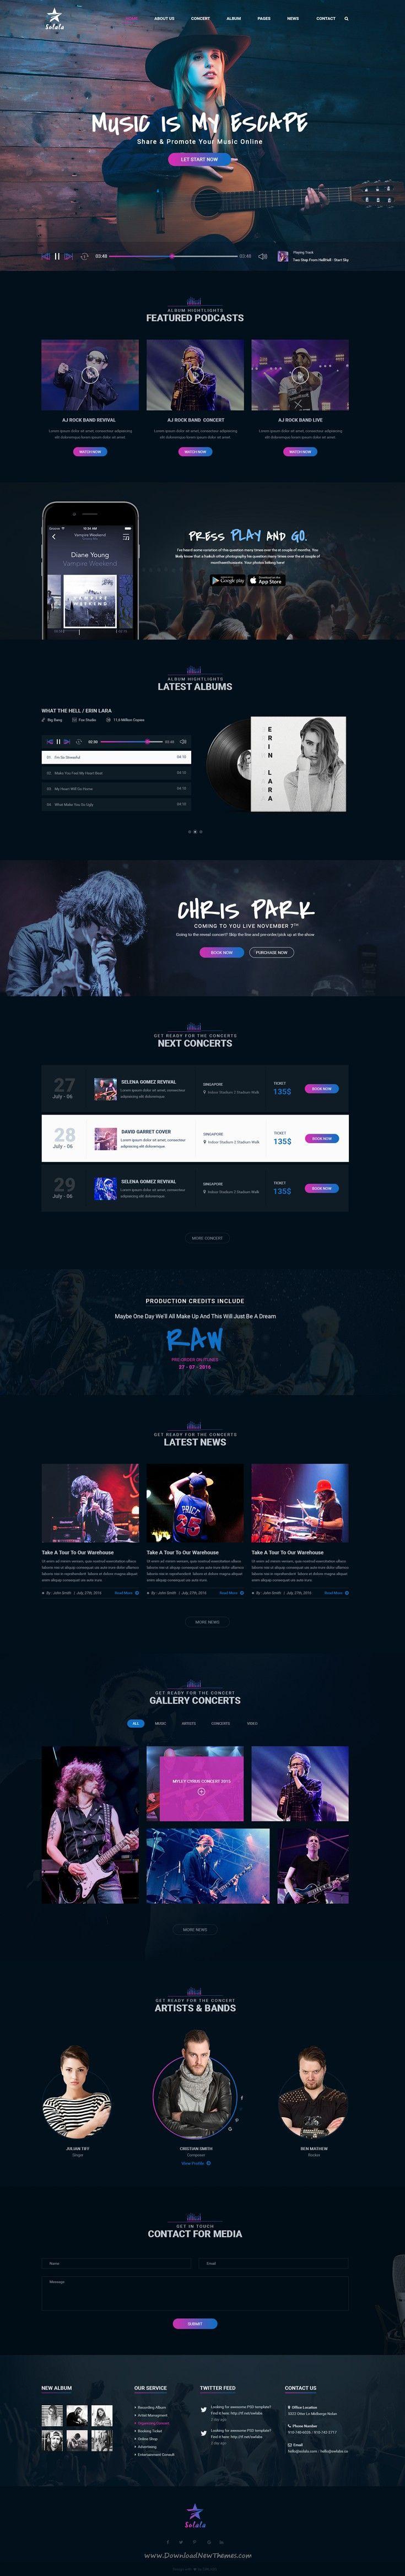 solala music artist bands entertainment psd template 9 web